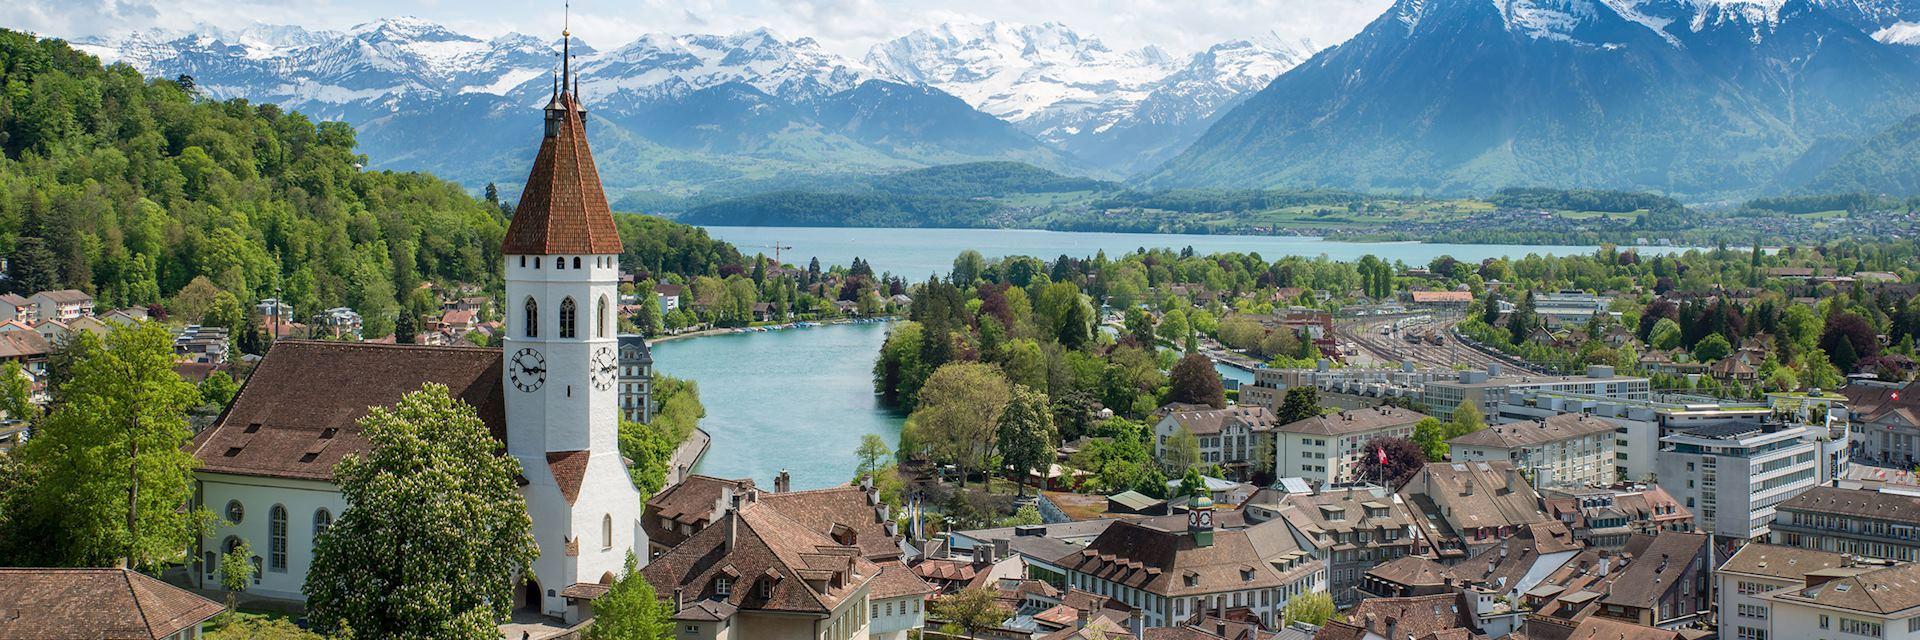 Historic city of Thun, Bern, Switzerland